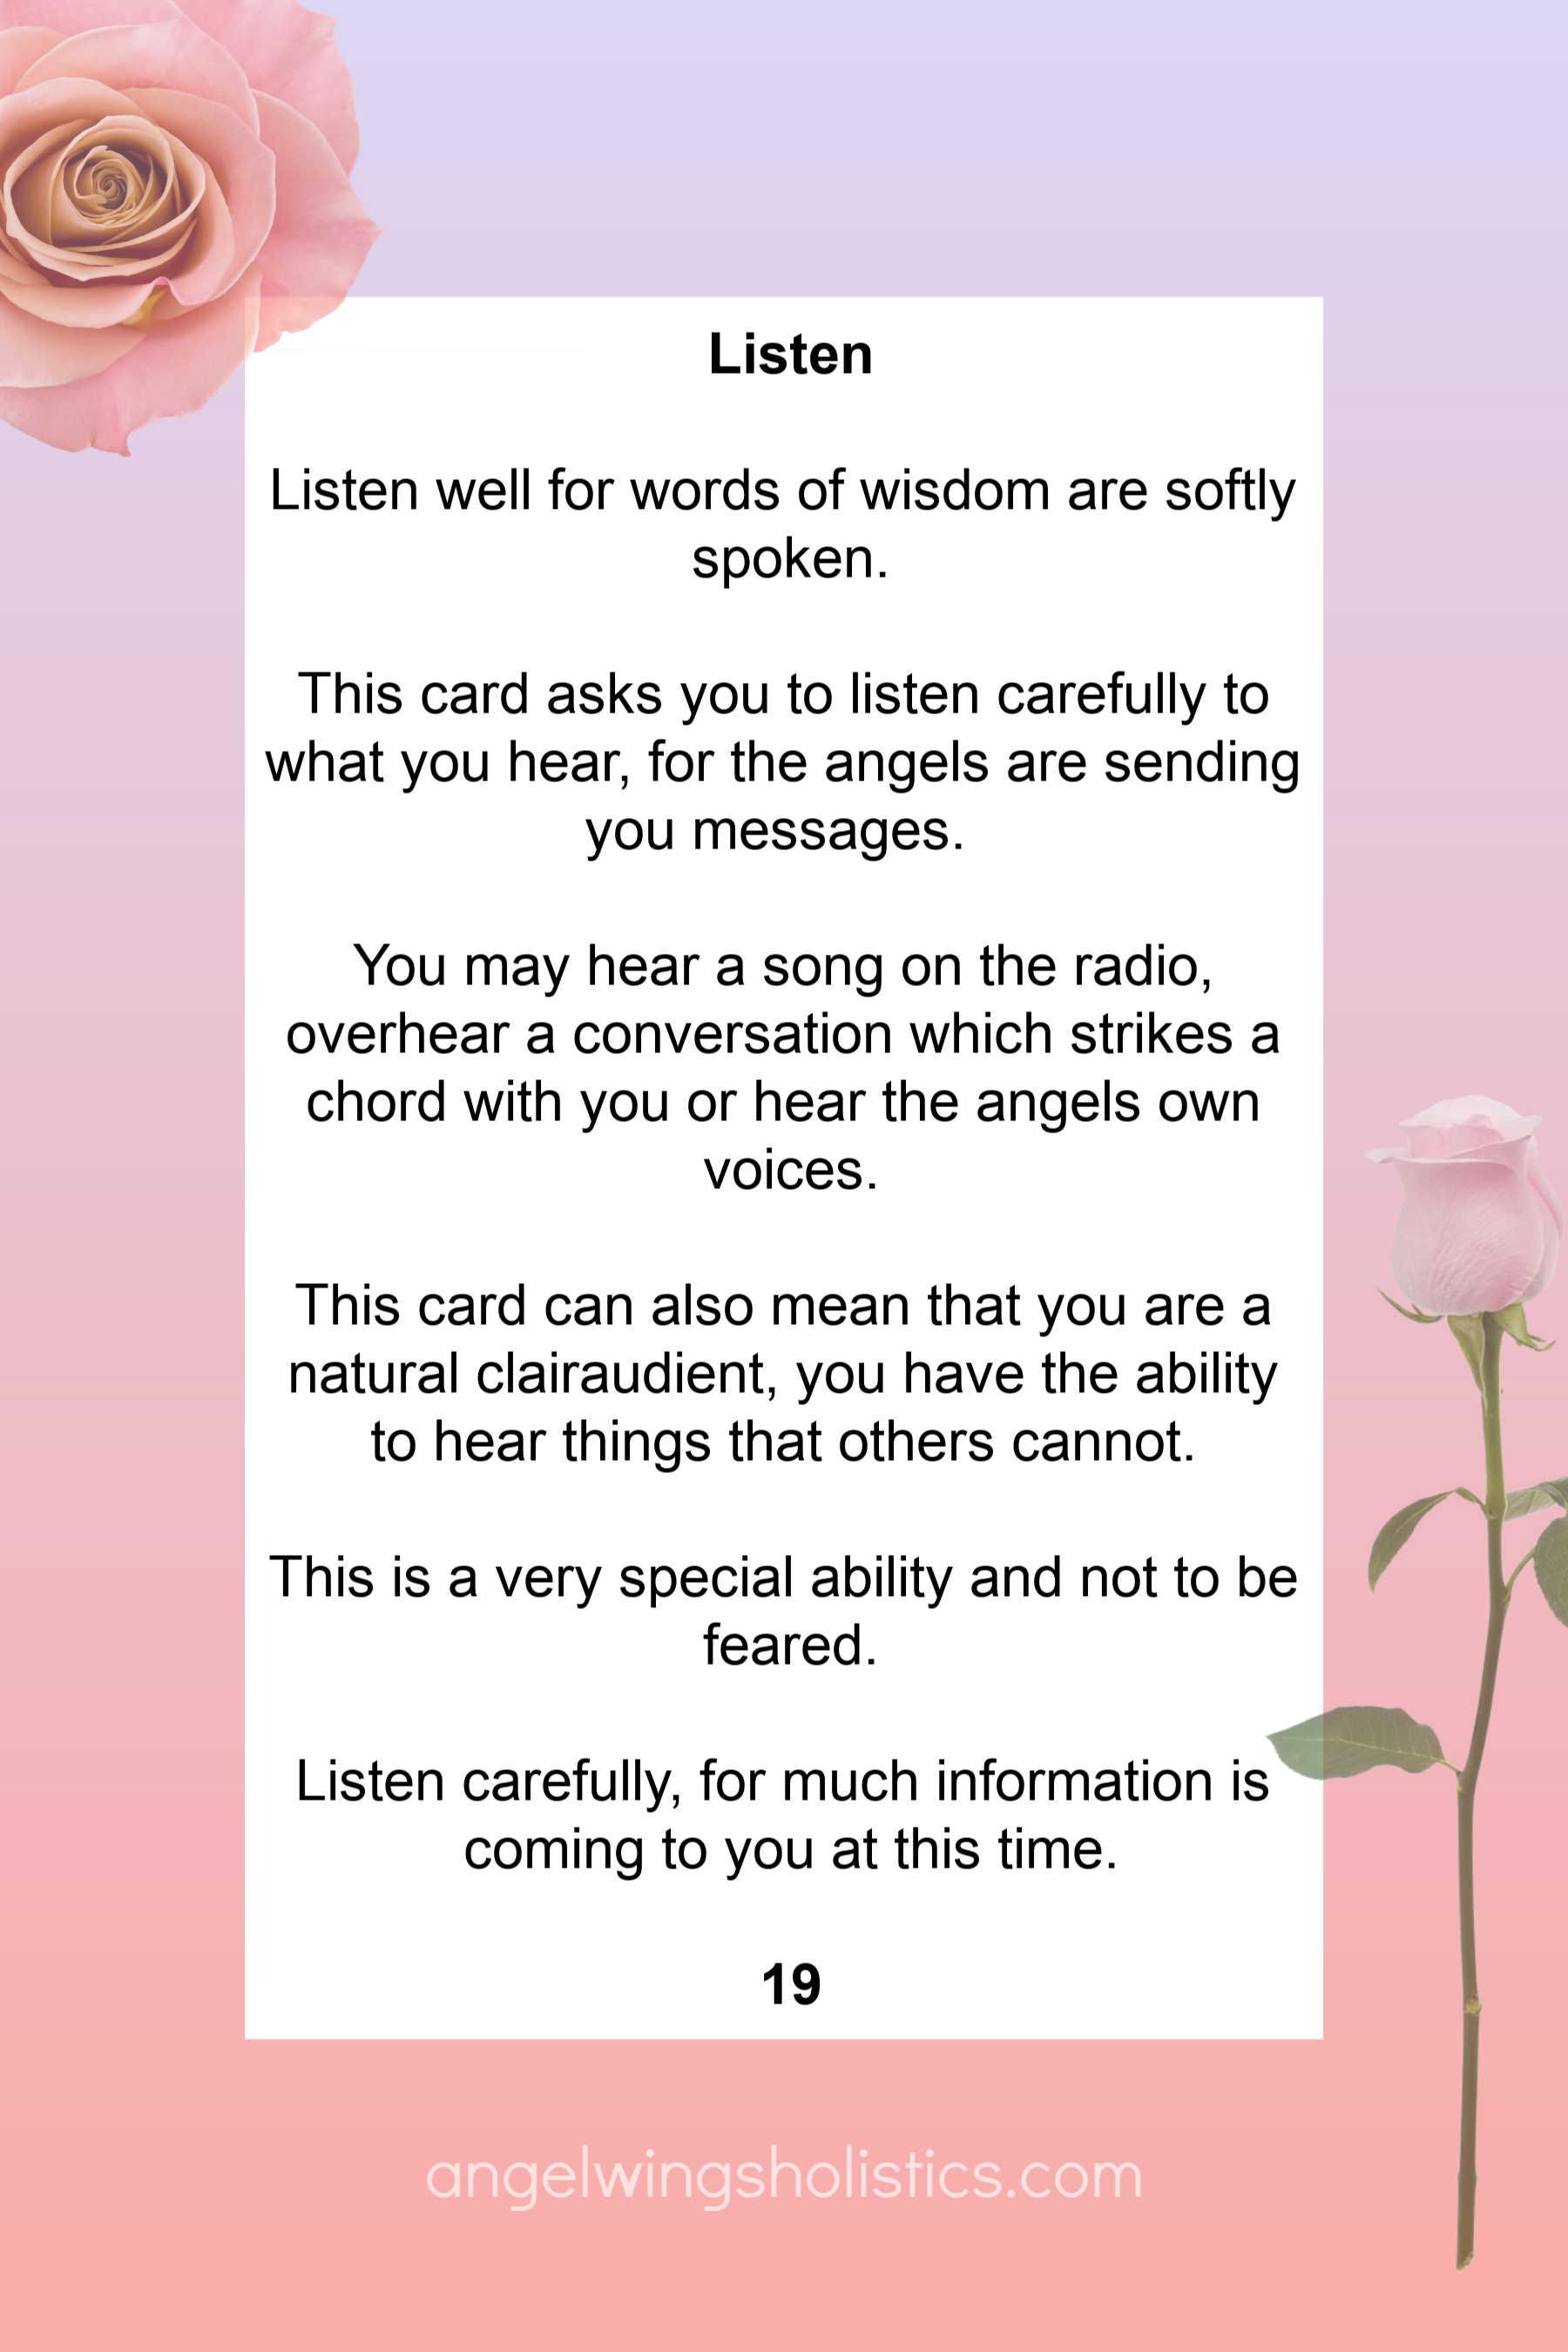 19-listen.jpg